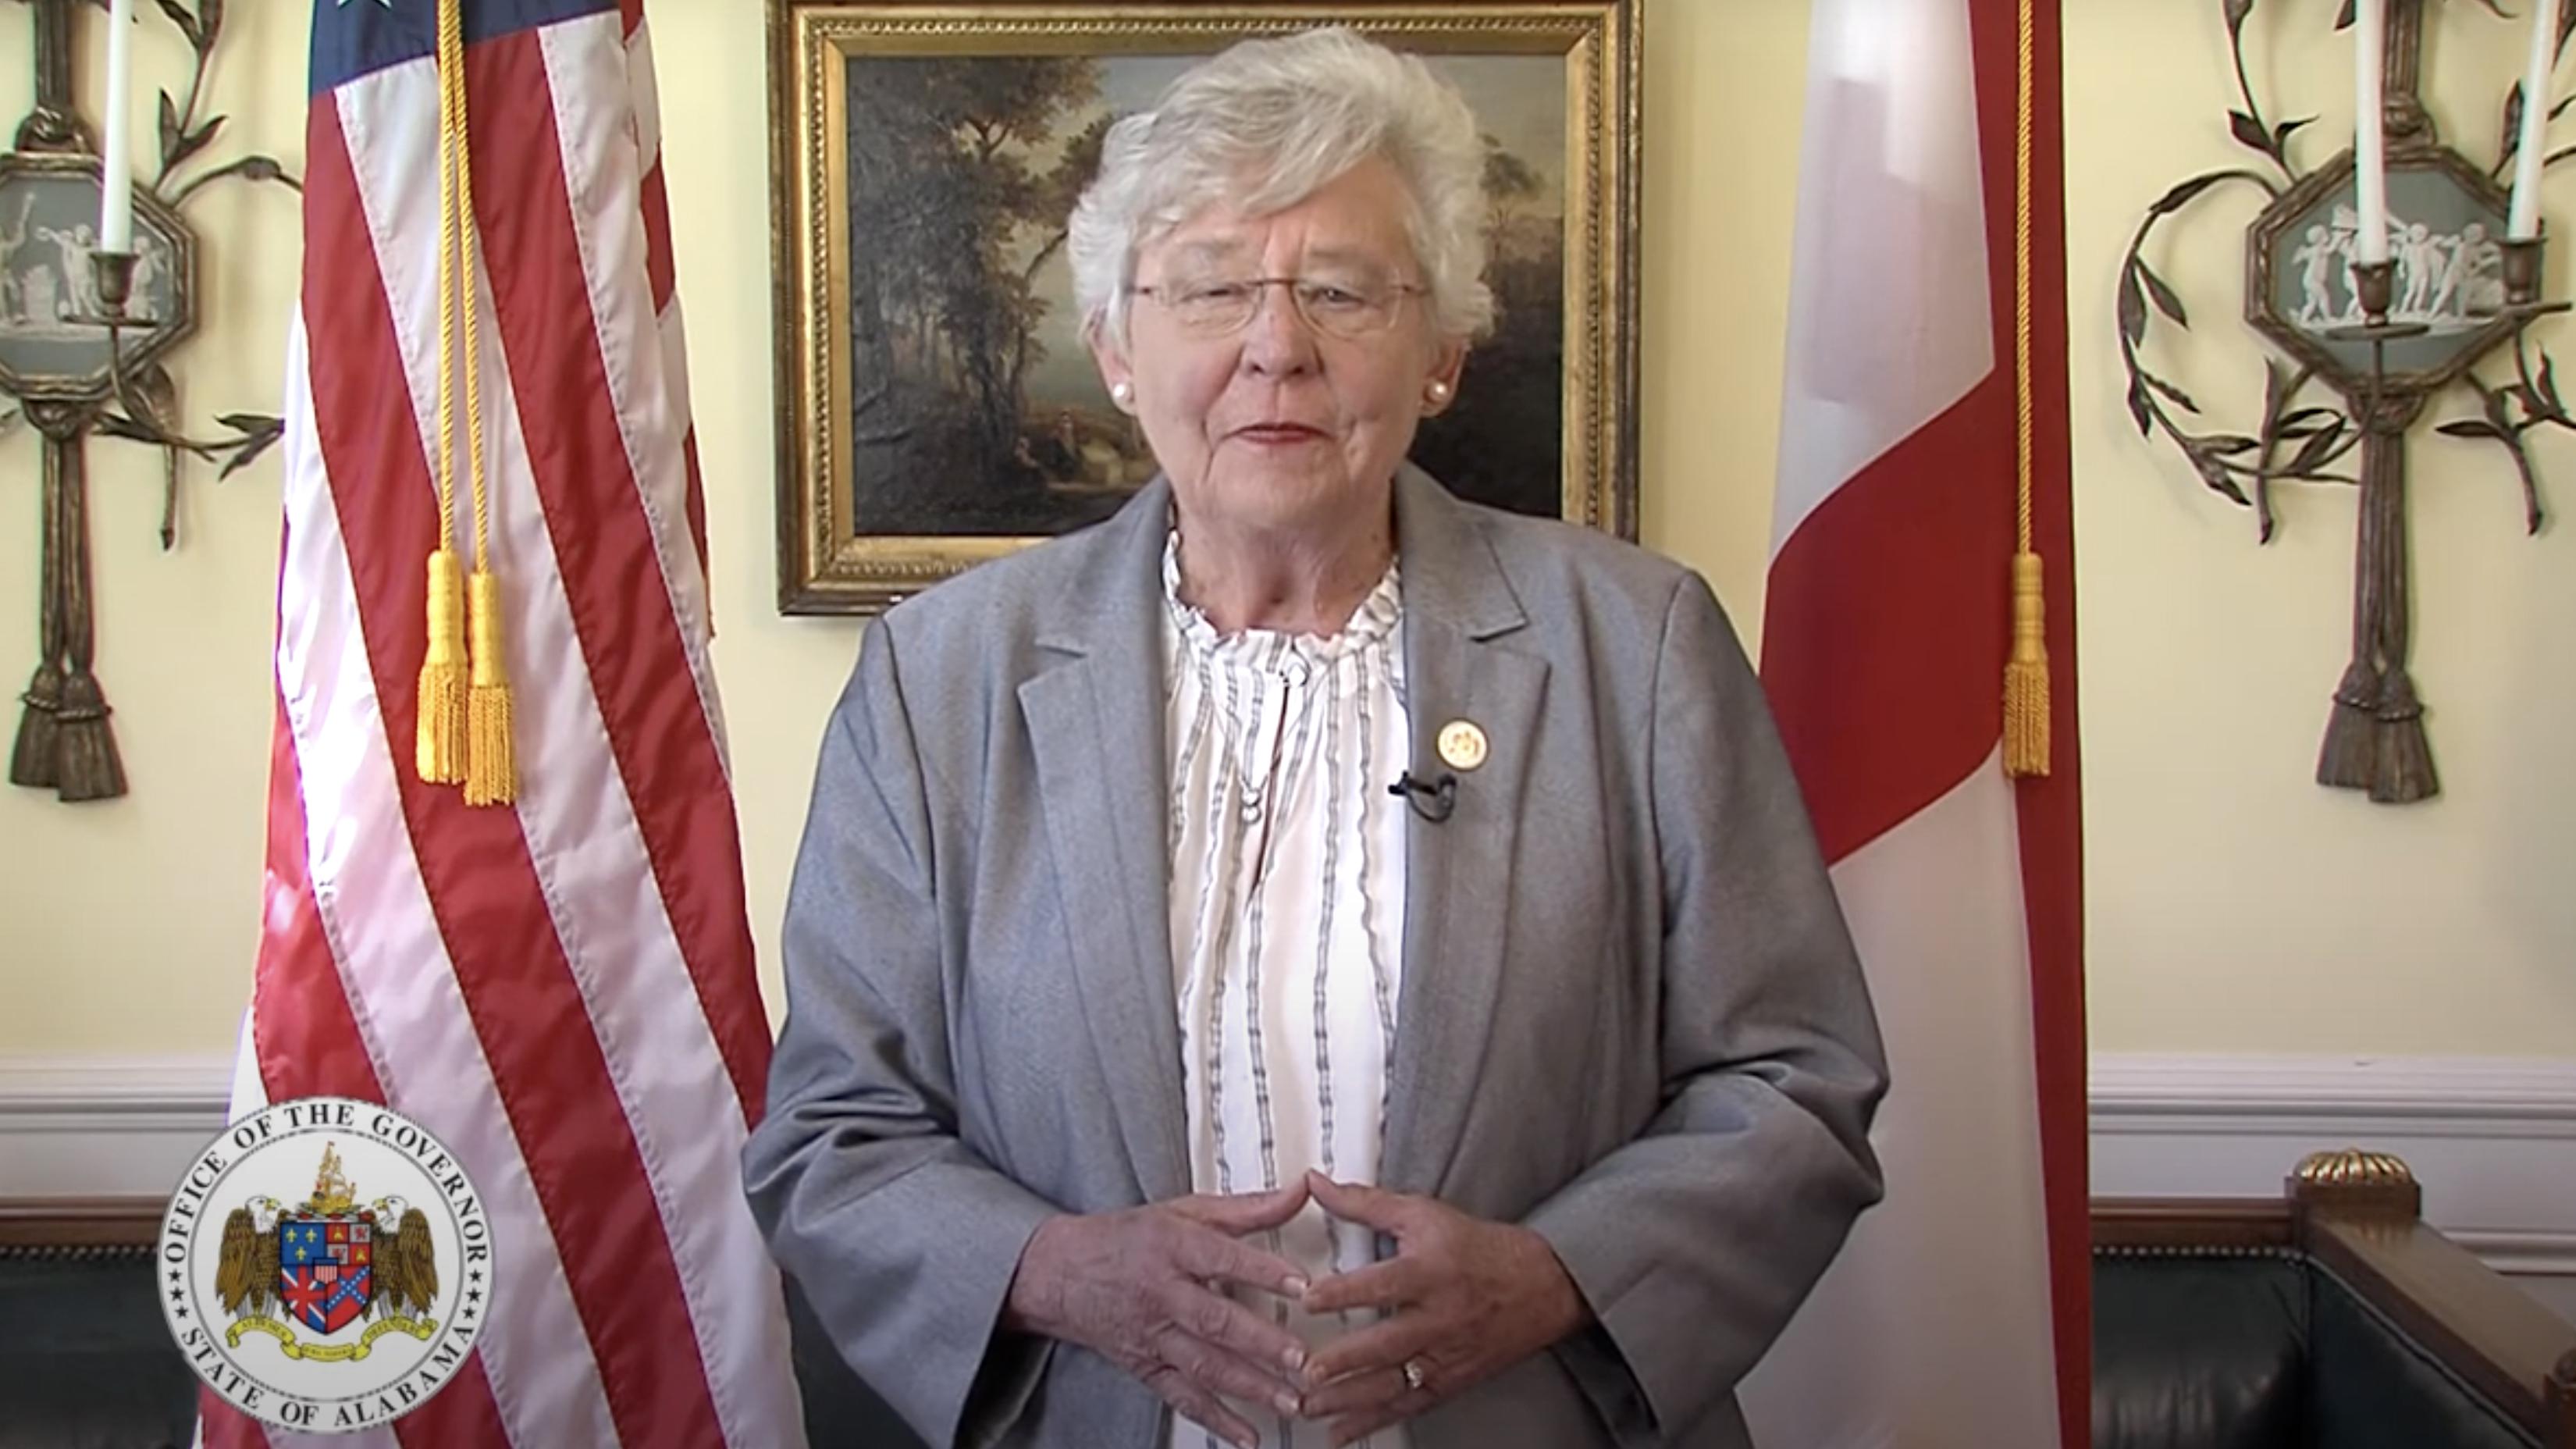 Alabama Gov. Kay Ivey